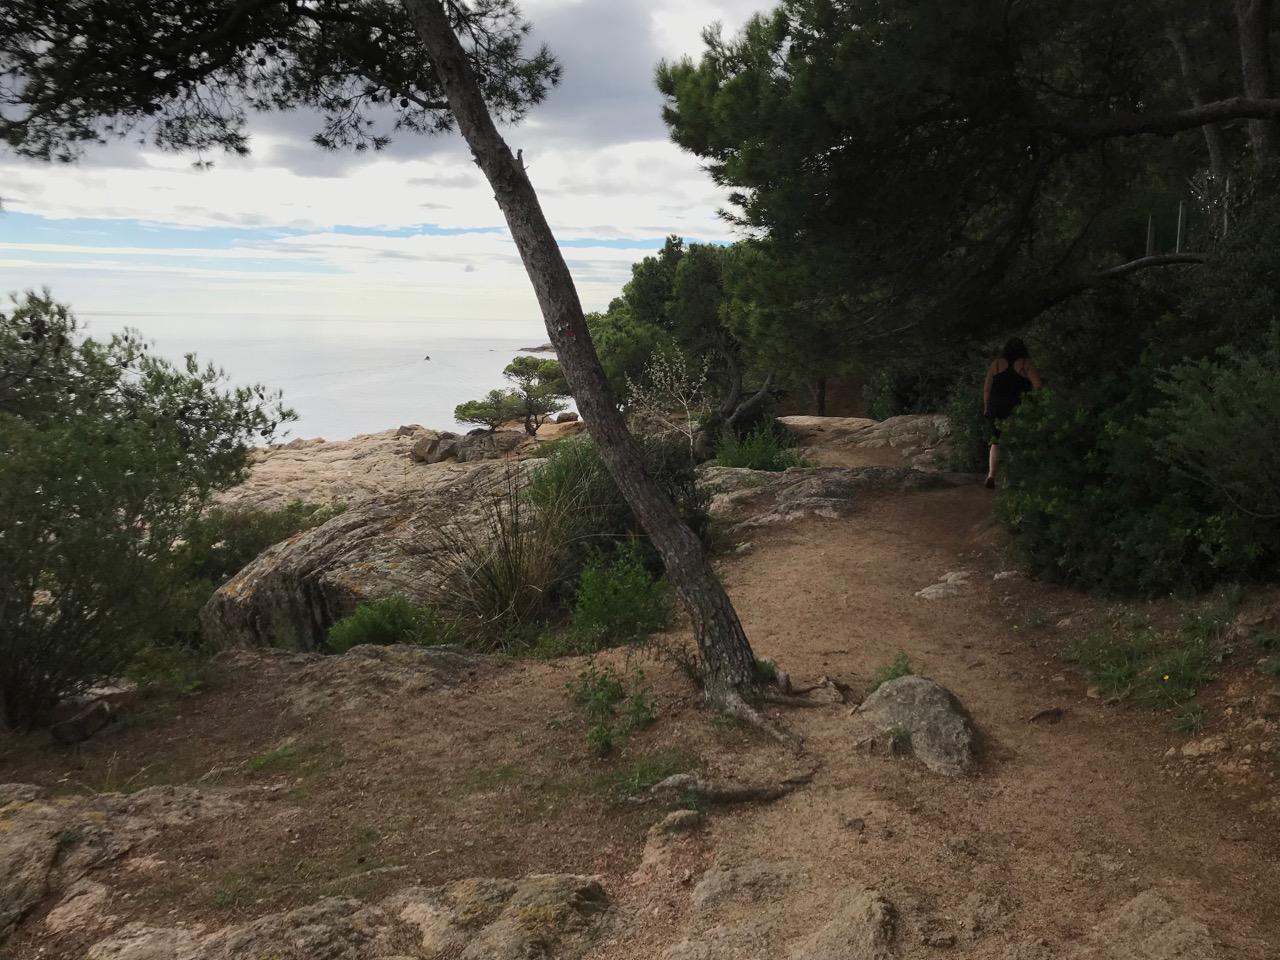 From Timariu to Llafranc